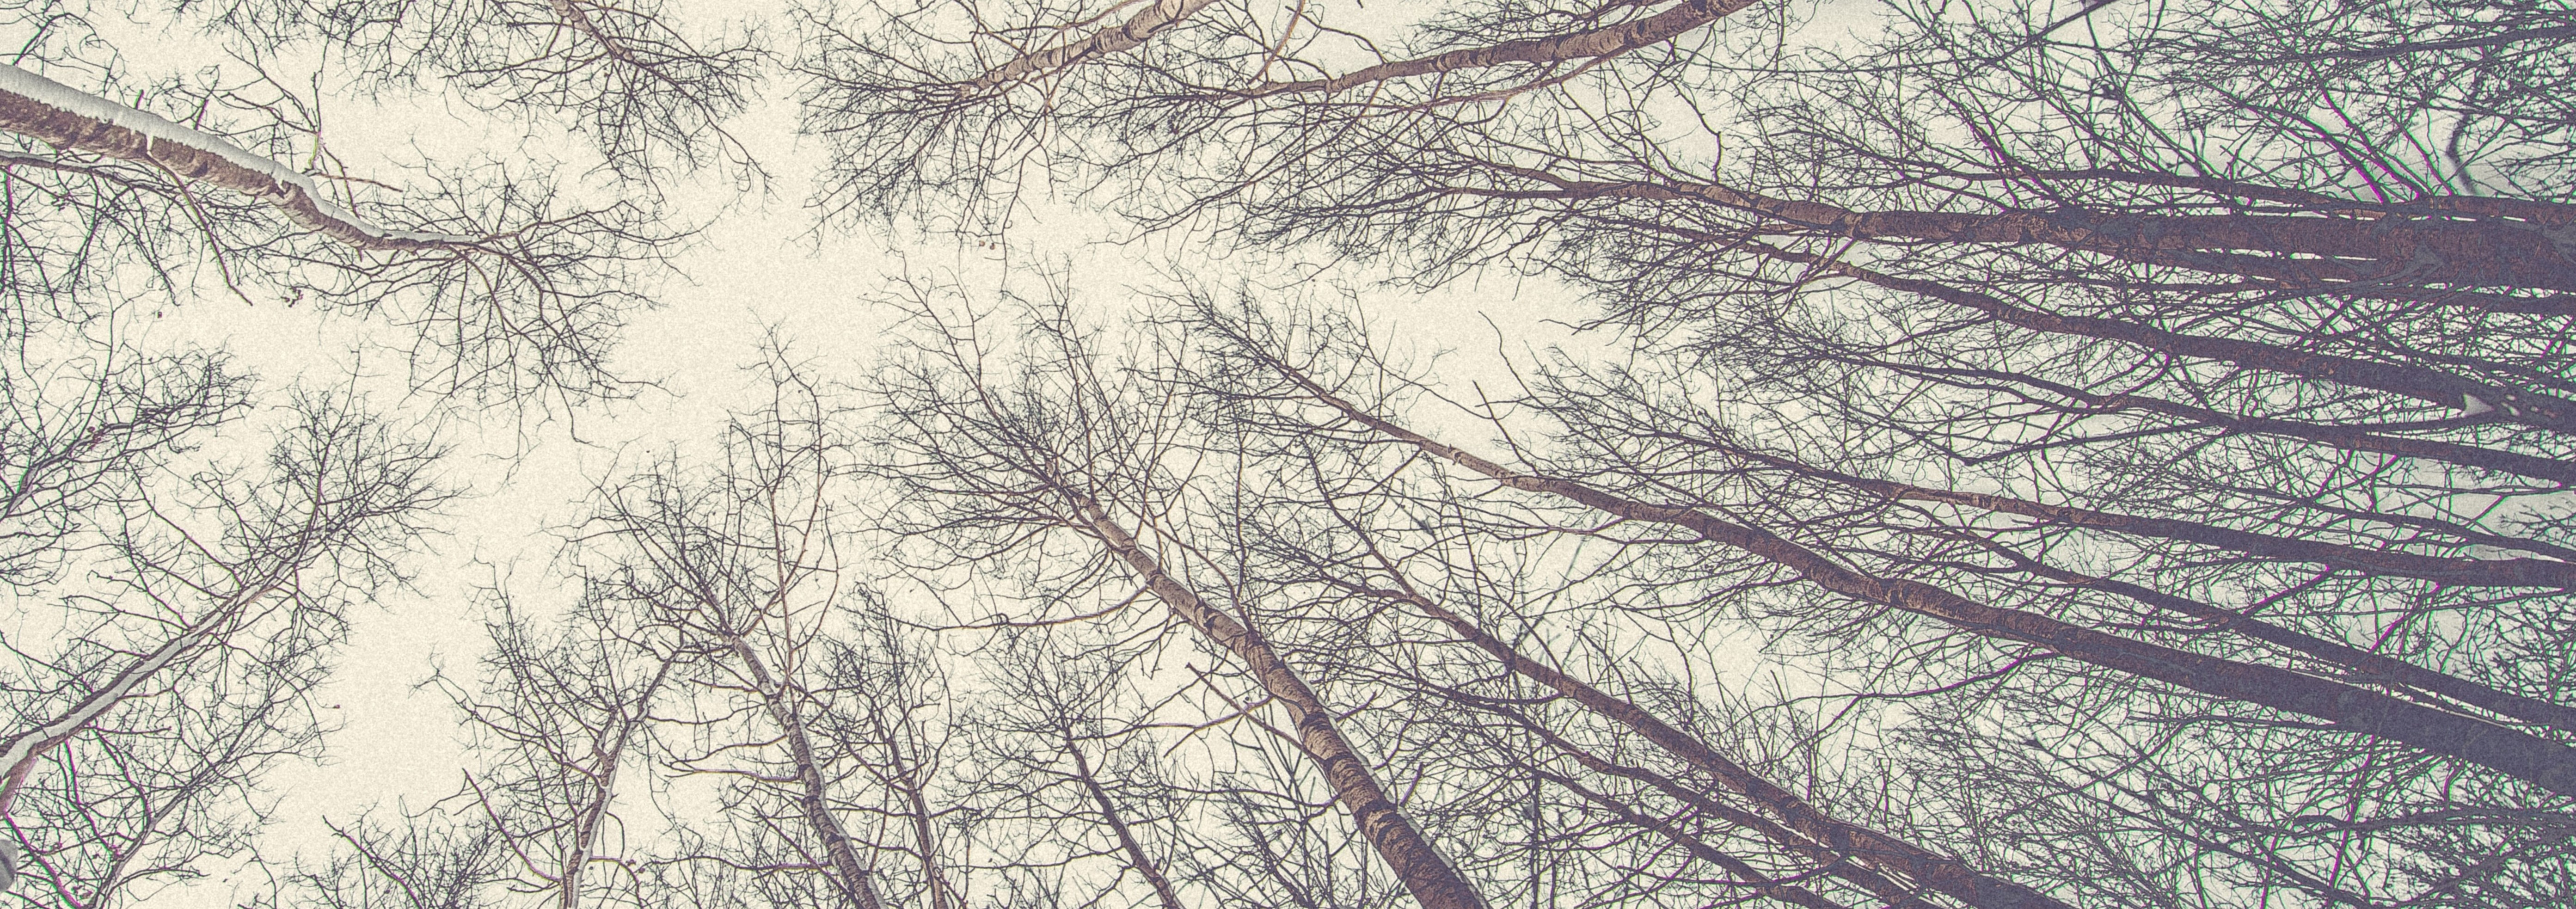 Art As Healing Trees